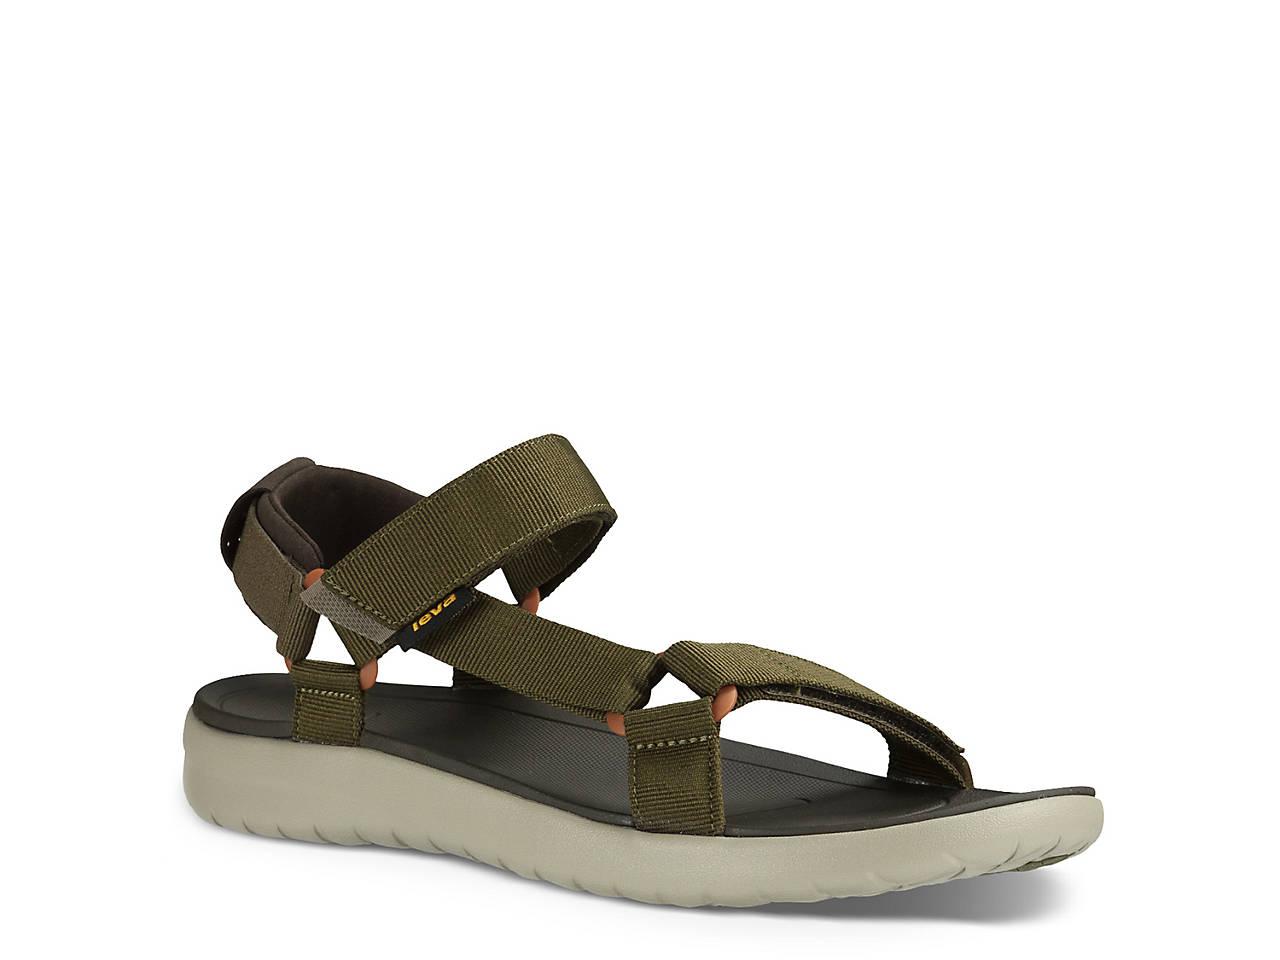 Teva Universal ShoesDsw Sandal Men's Sanborn yvYb6f7g